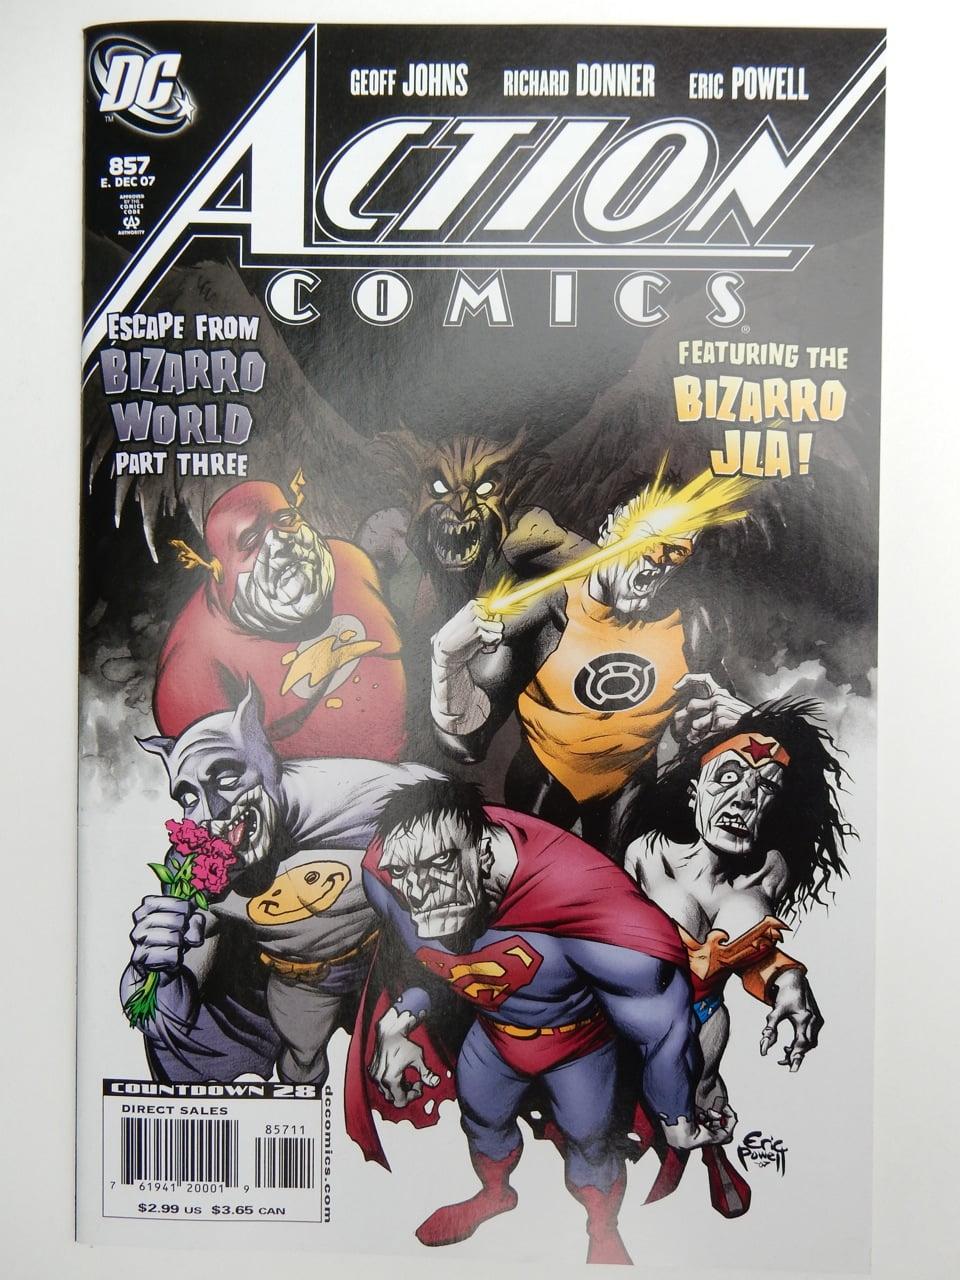 Action Comics #857